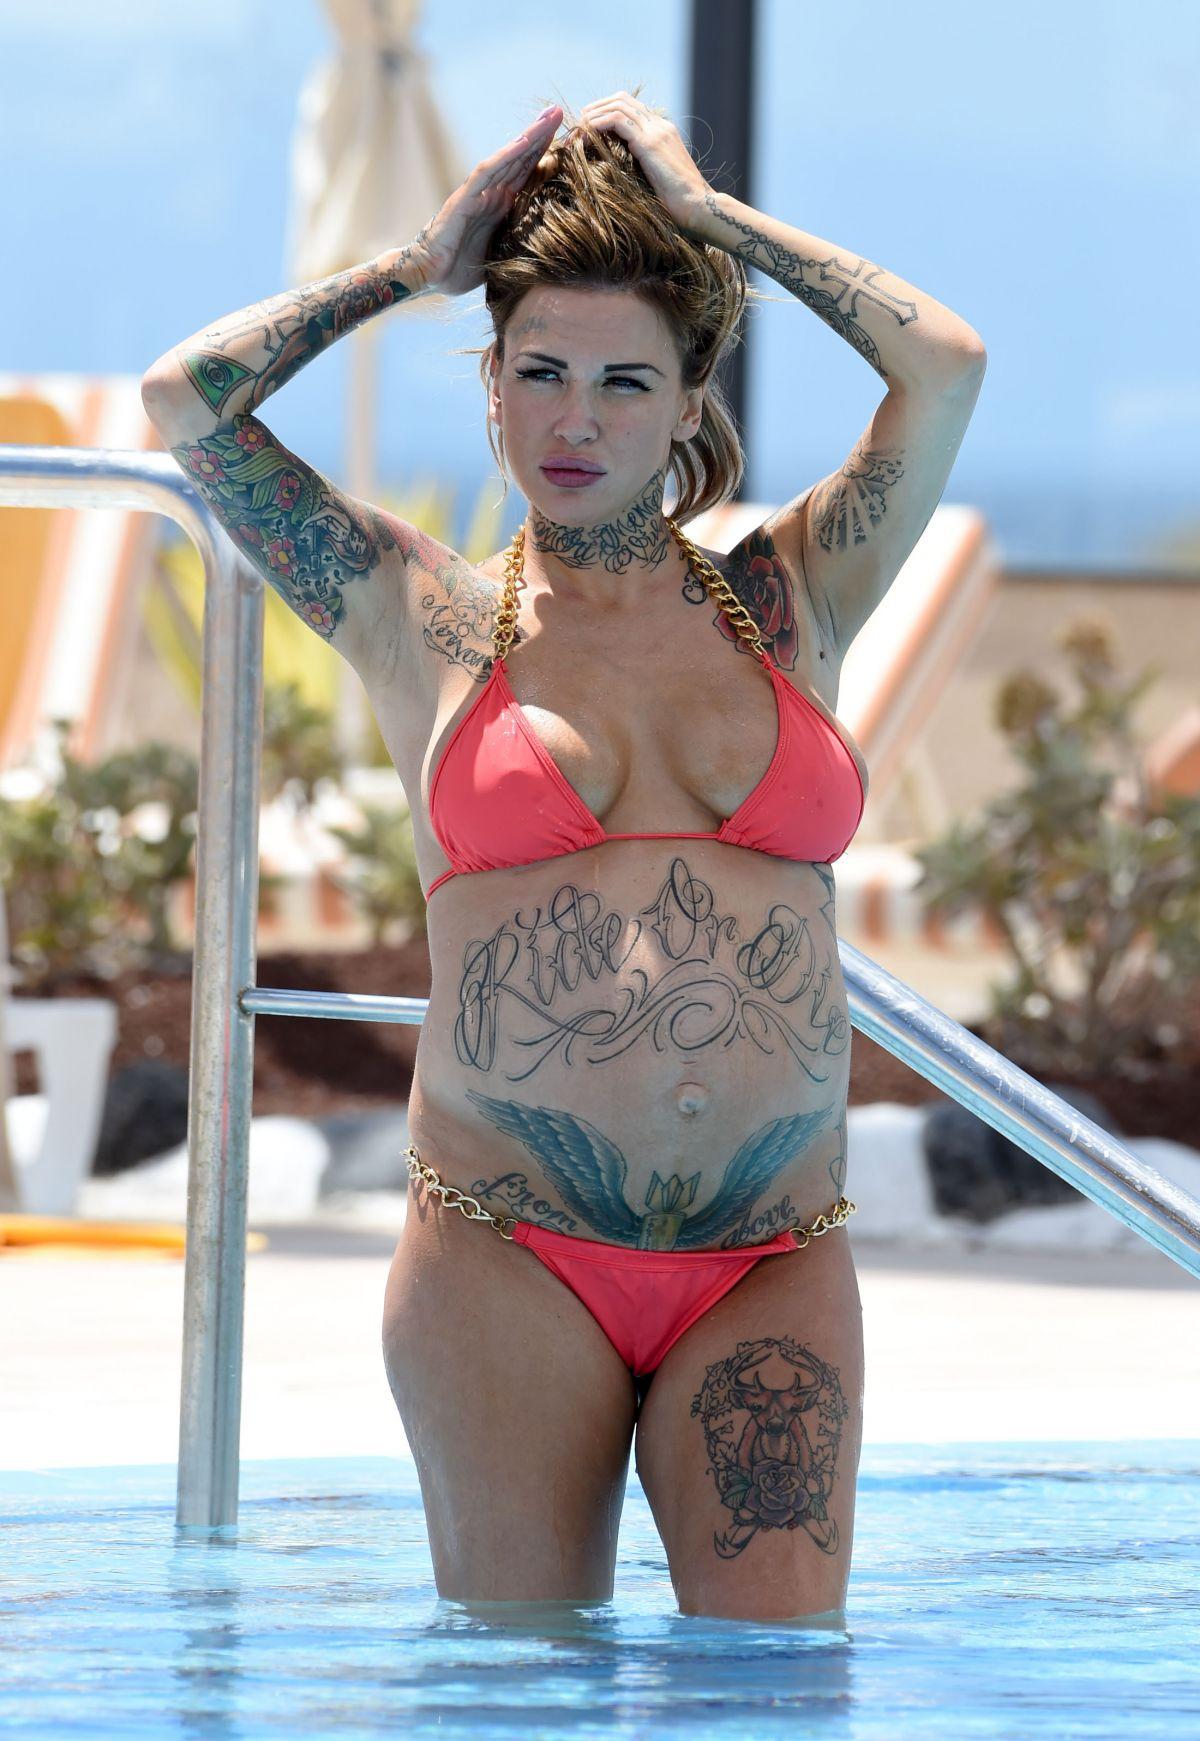 Pregnant SALLIE AXL in Bikini at a Pool in Tenerife 05/11/2016